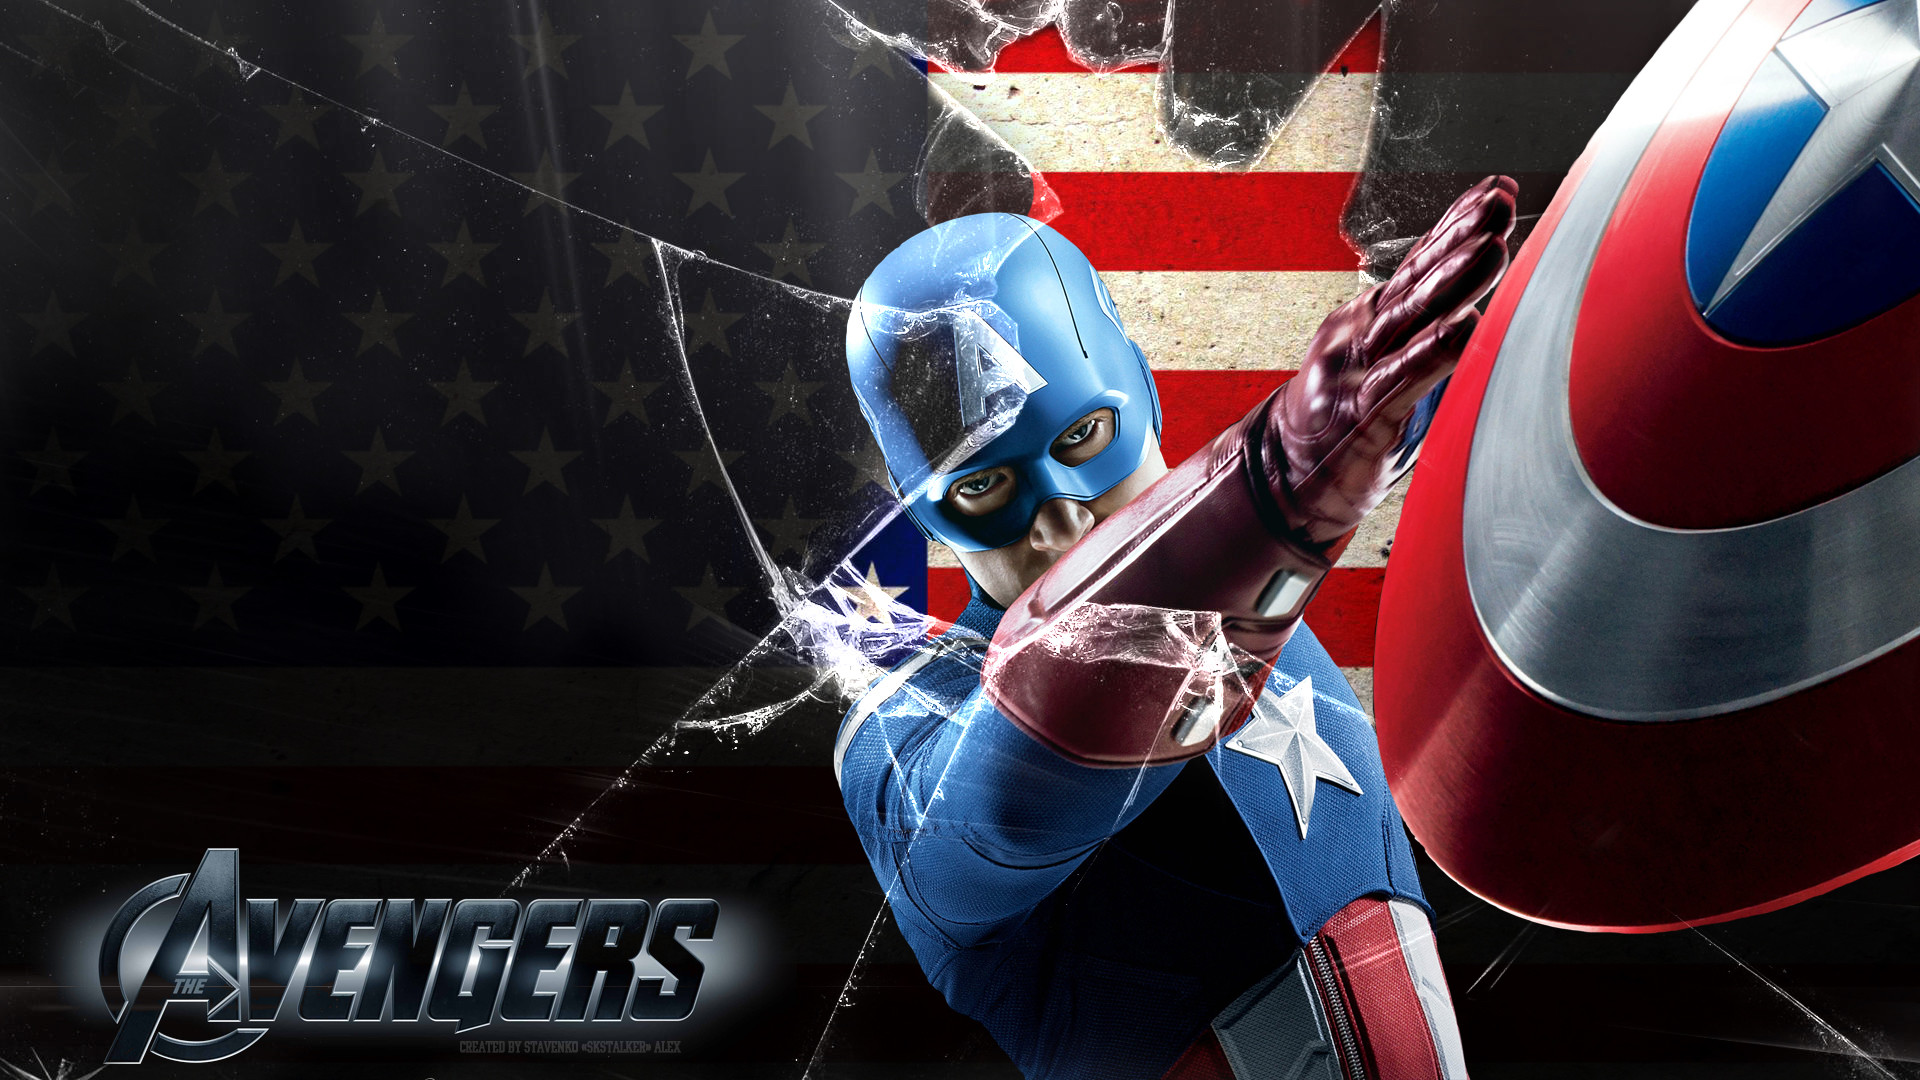 1920x1080, Captain America Avengers Wallpapers For - Avengers 2012 Captain America - HD Wallpaper